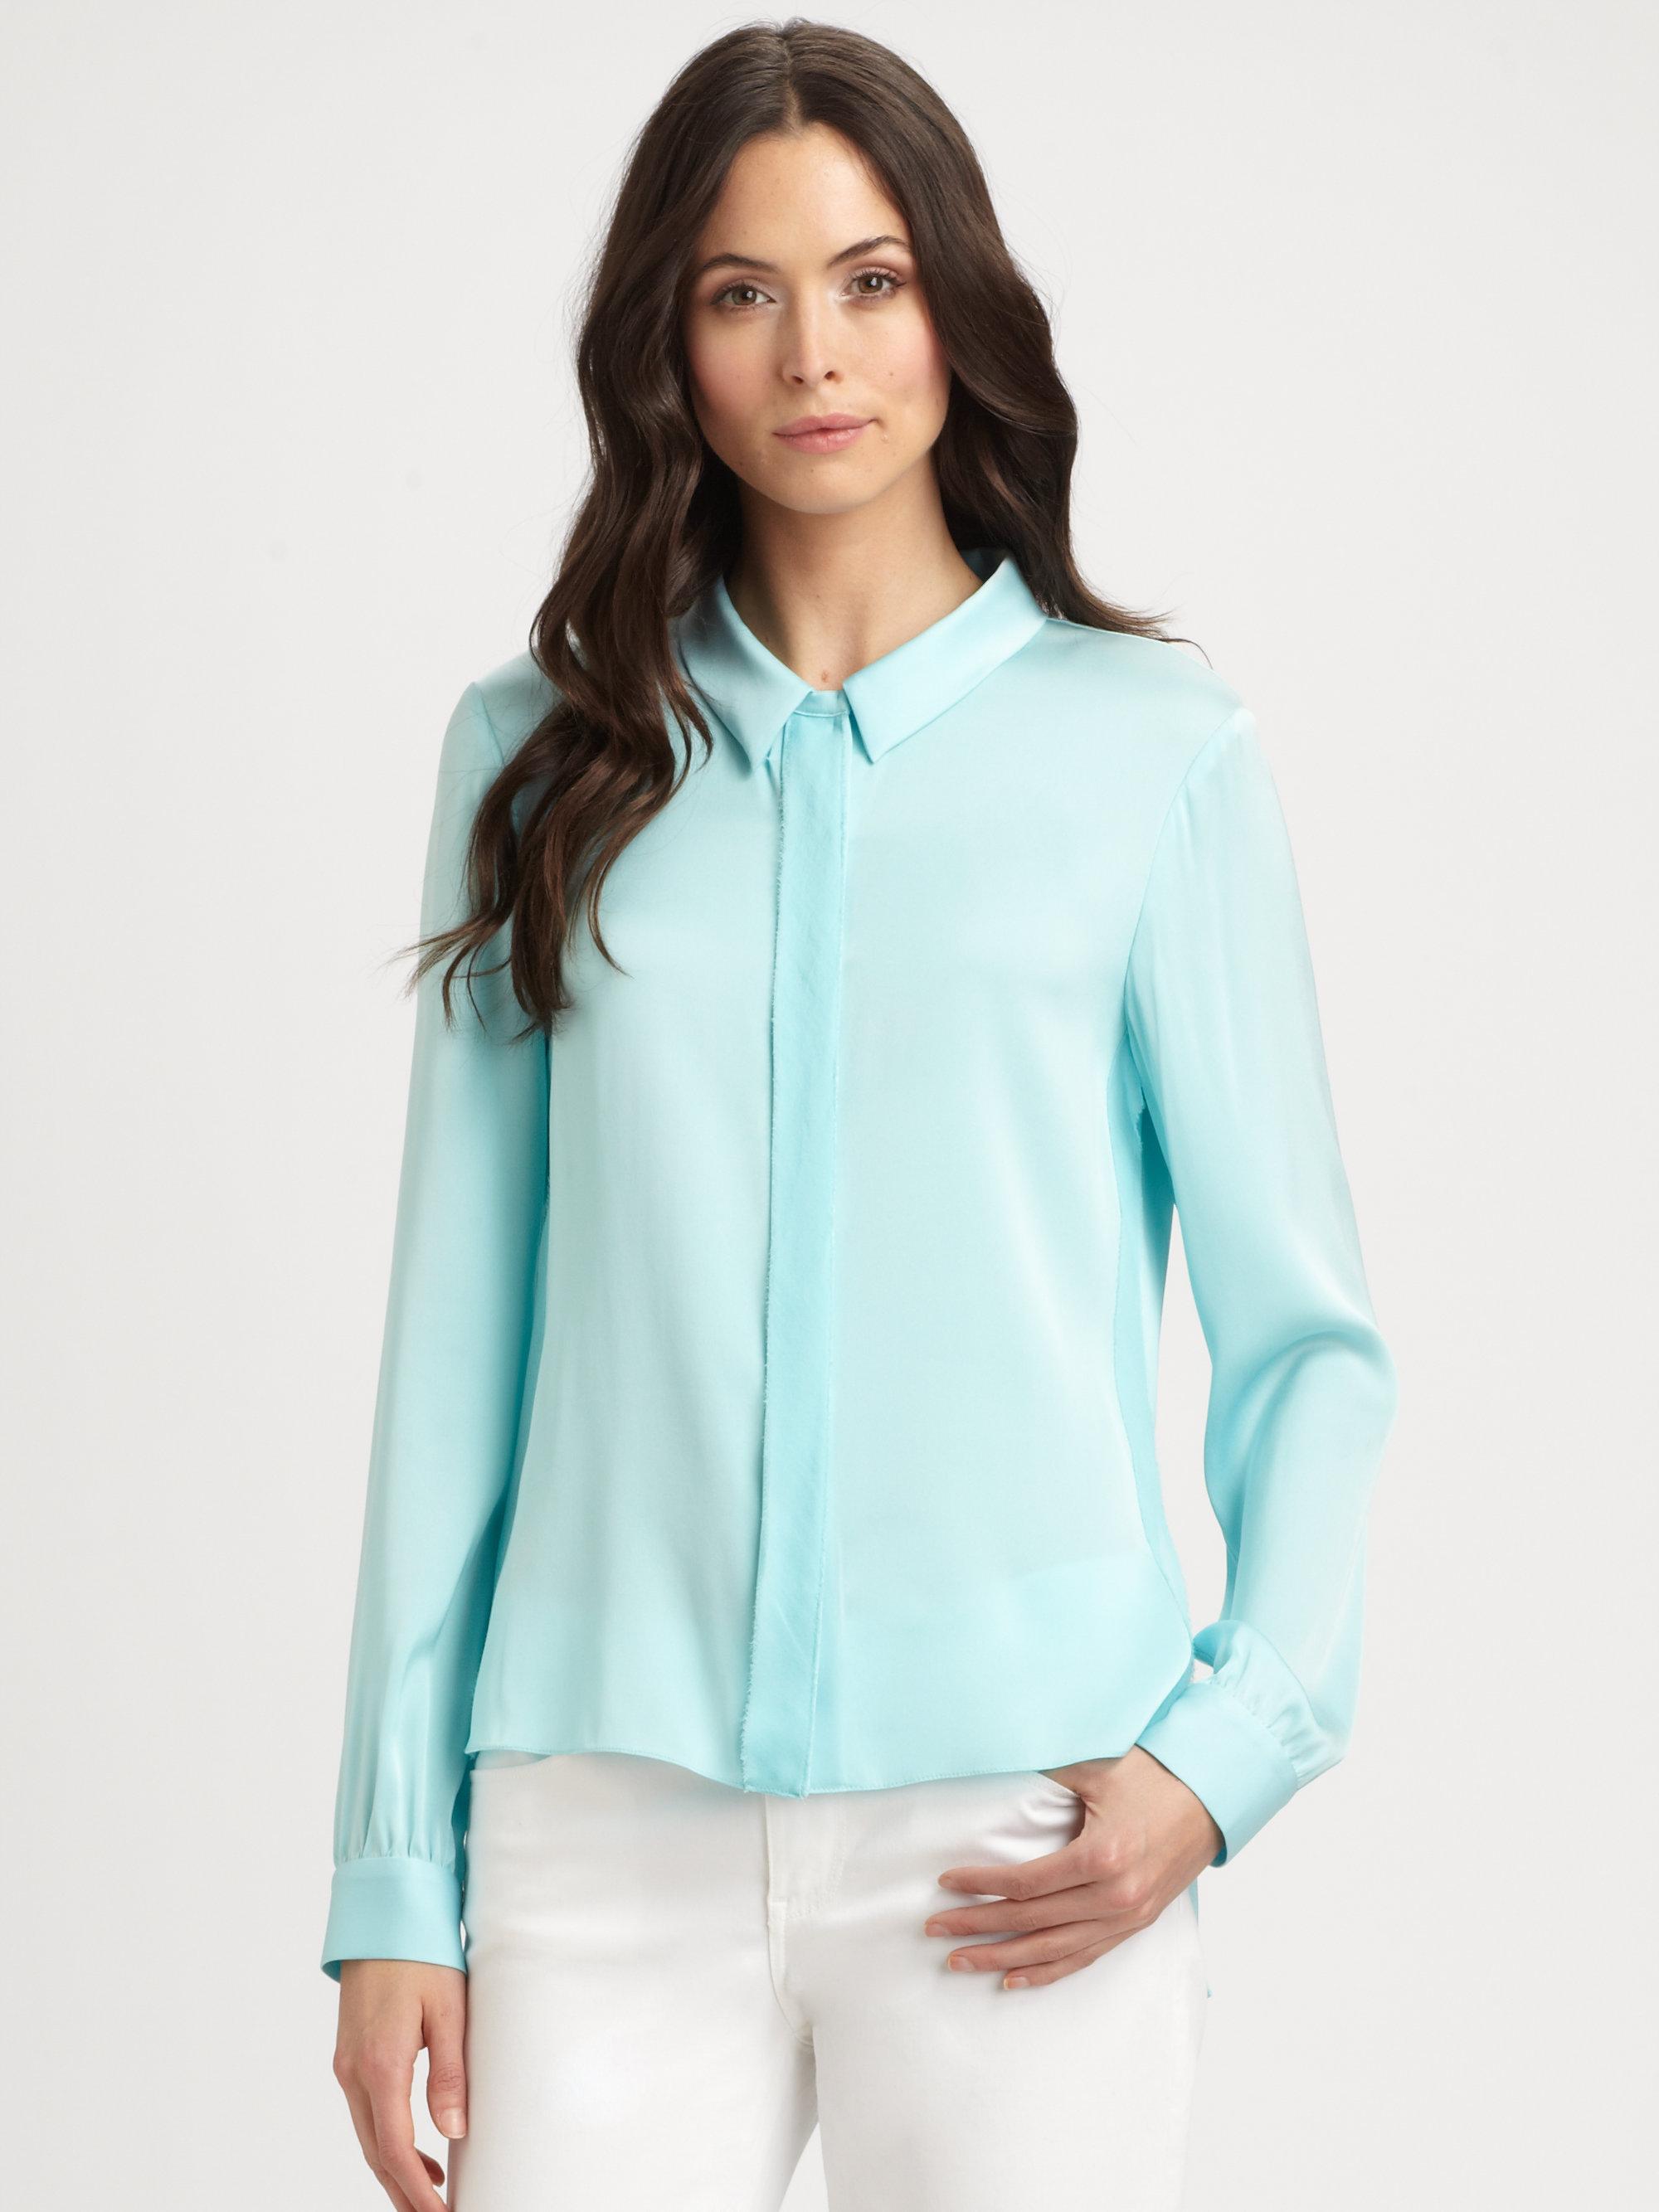 Elie tahari Brenda Stretch Silk Blouse in Blue | Lyst